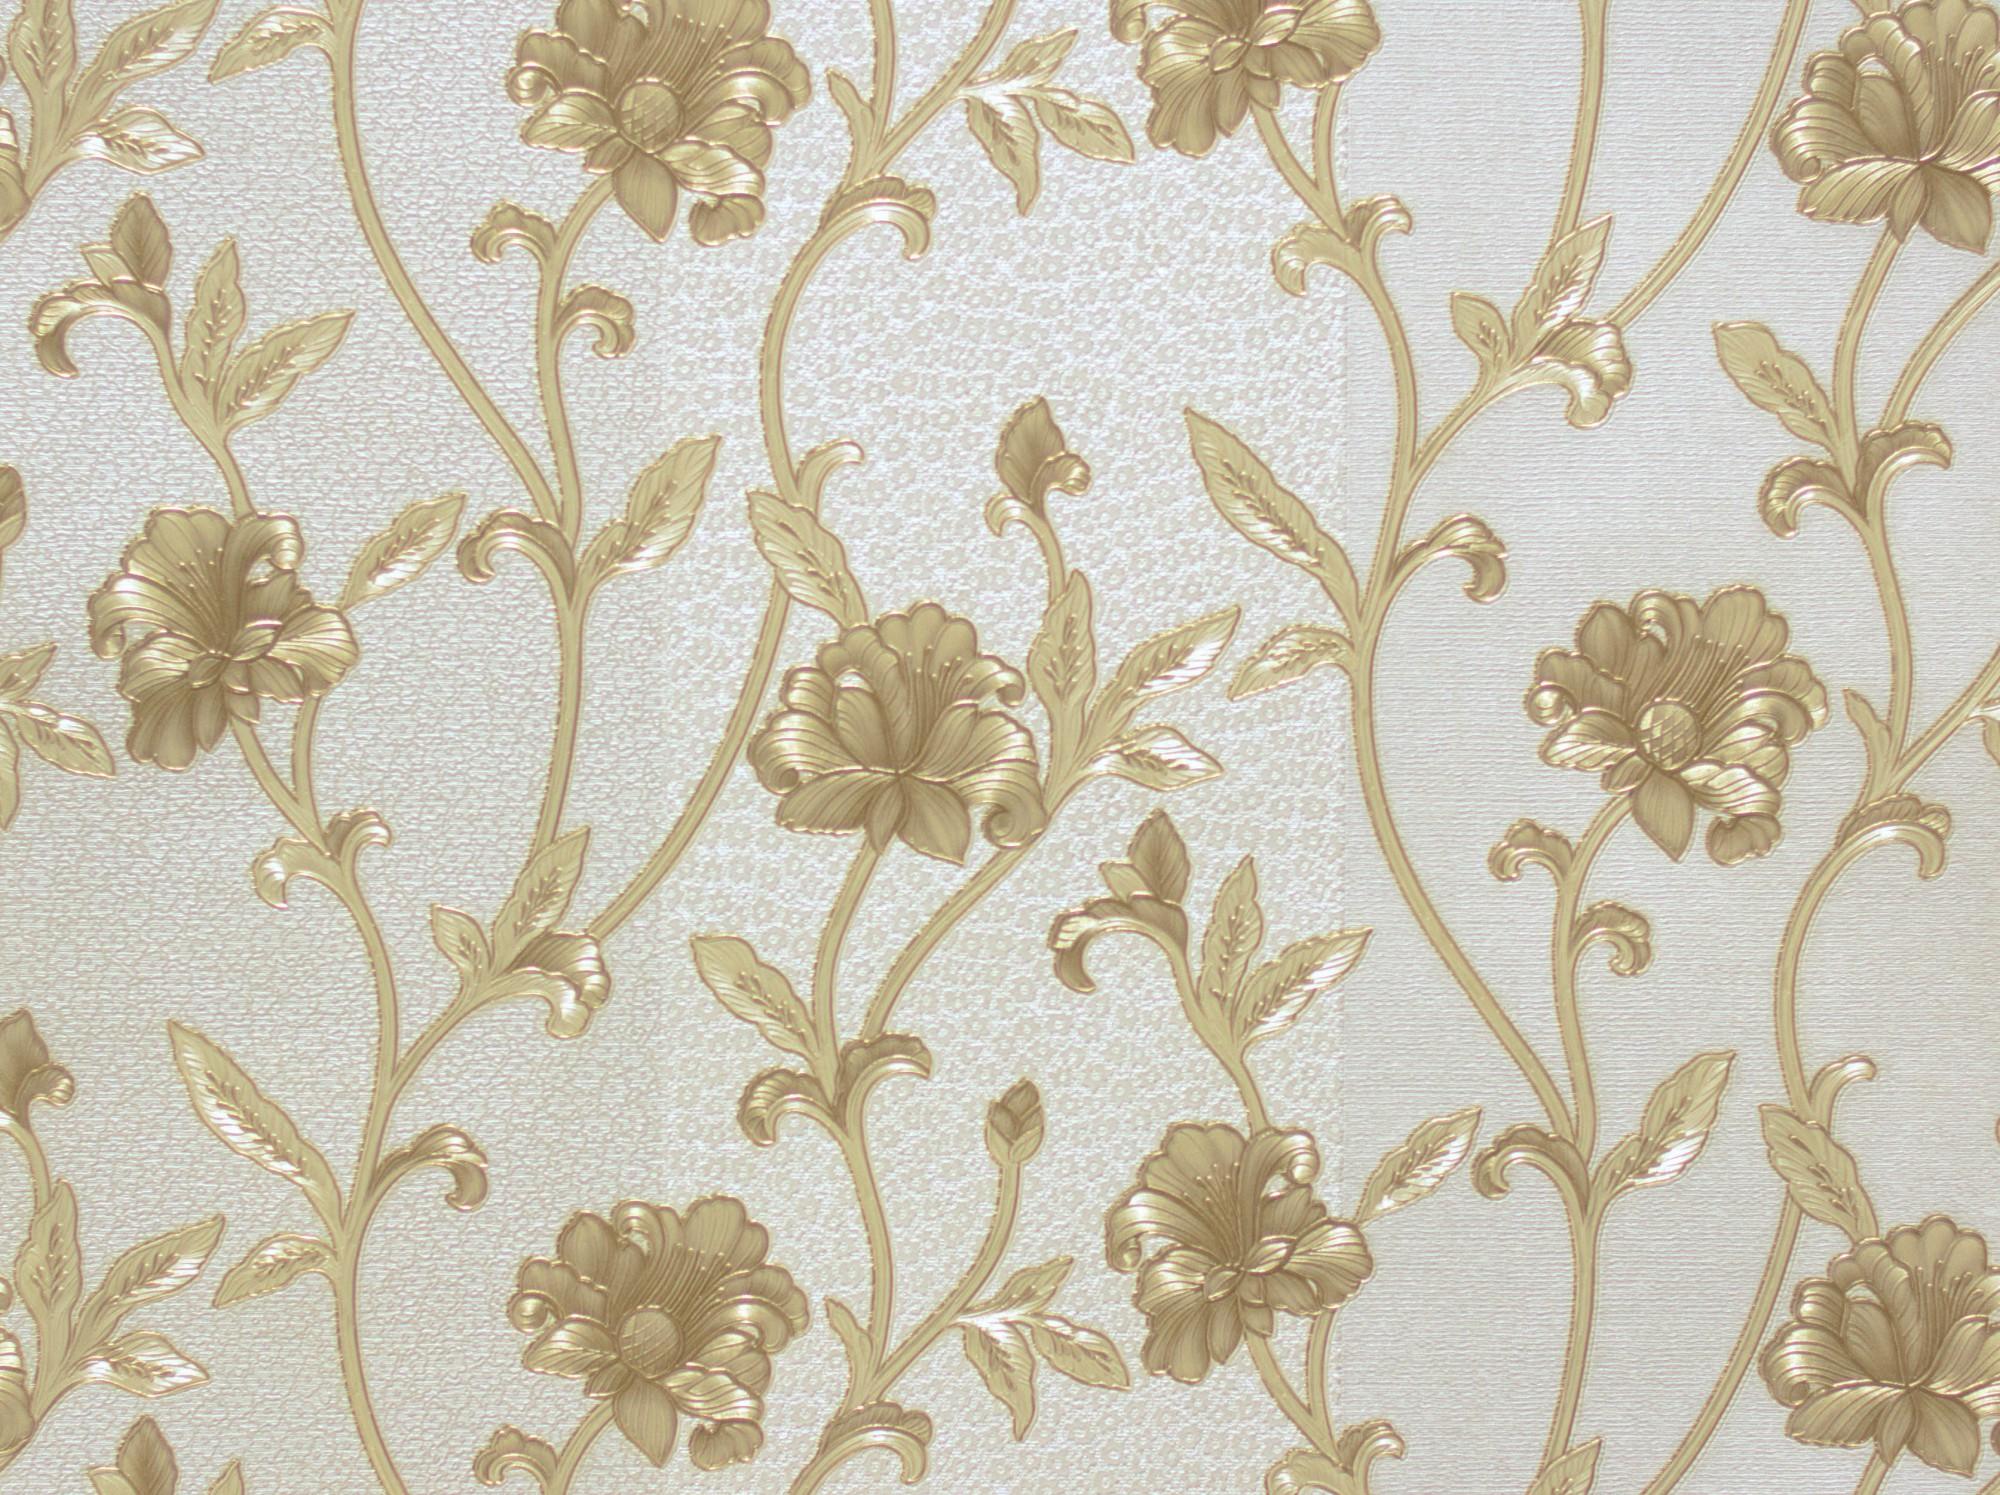 Tapete Hermitage Gestreift grau gold 94344-3